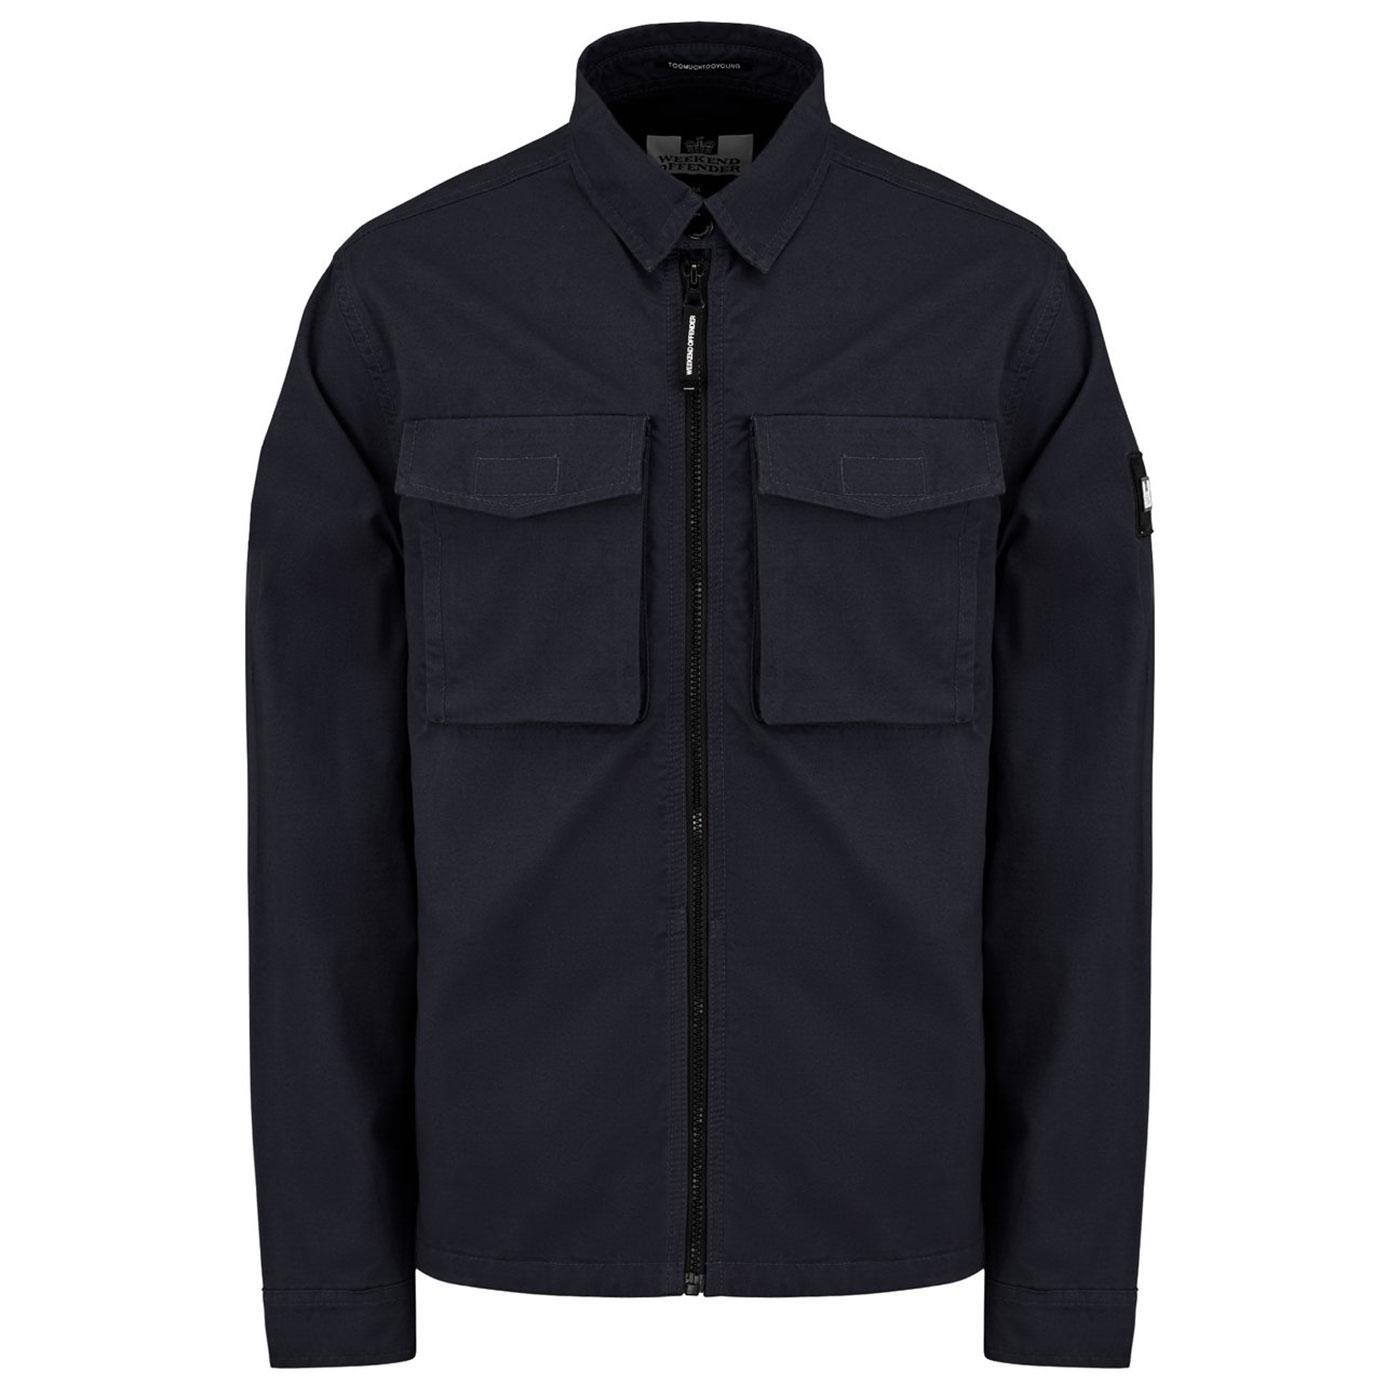 Pileggi WEEKEND OFFENDER Military Overshirt Jacket